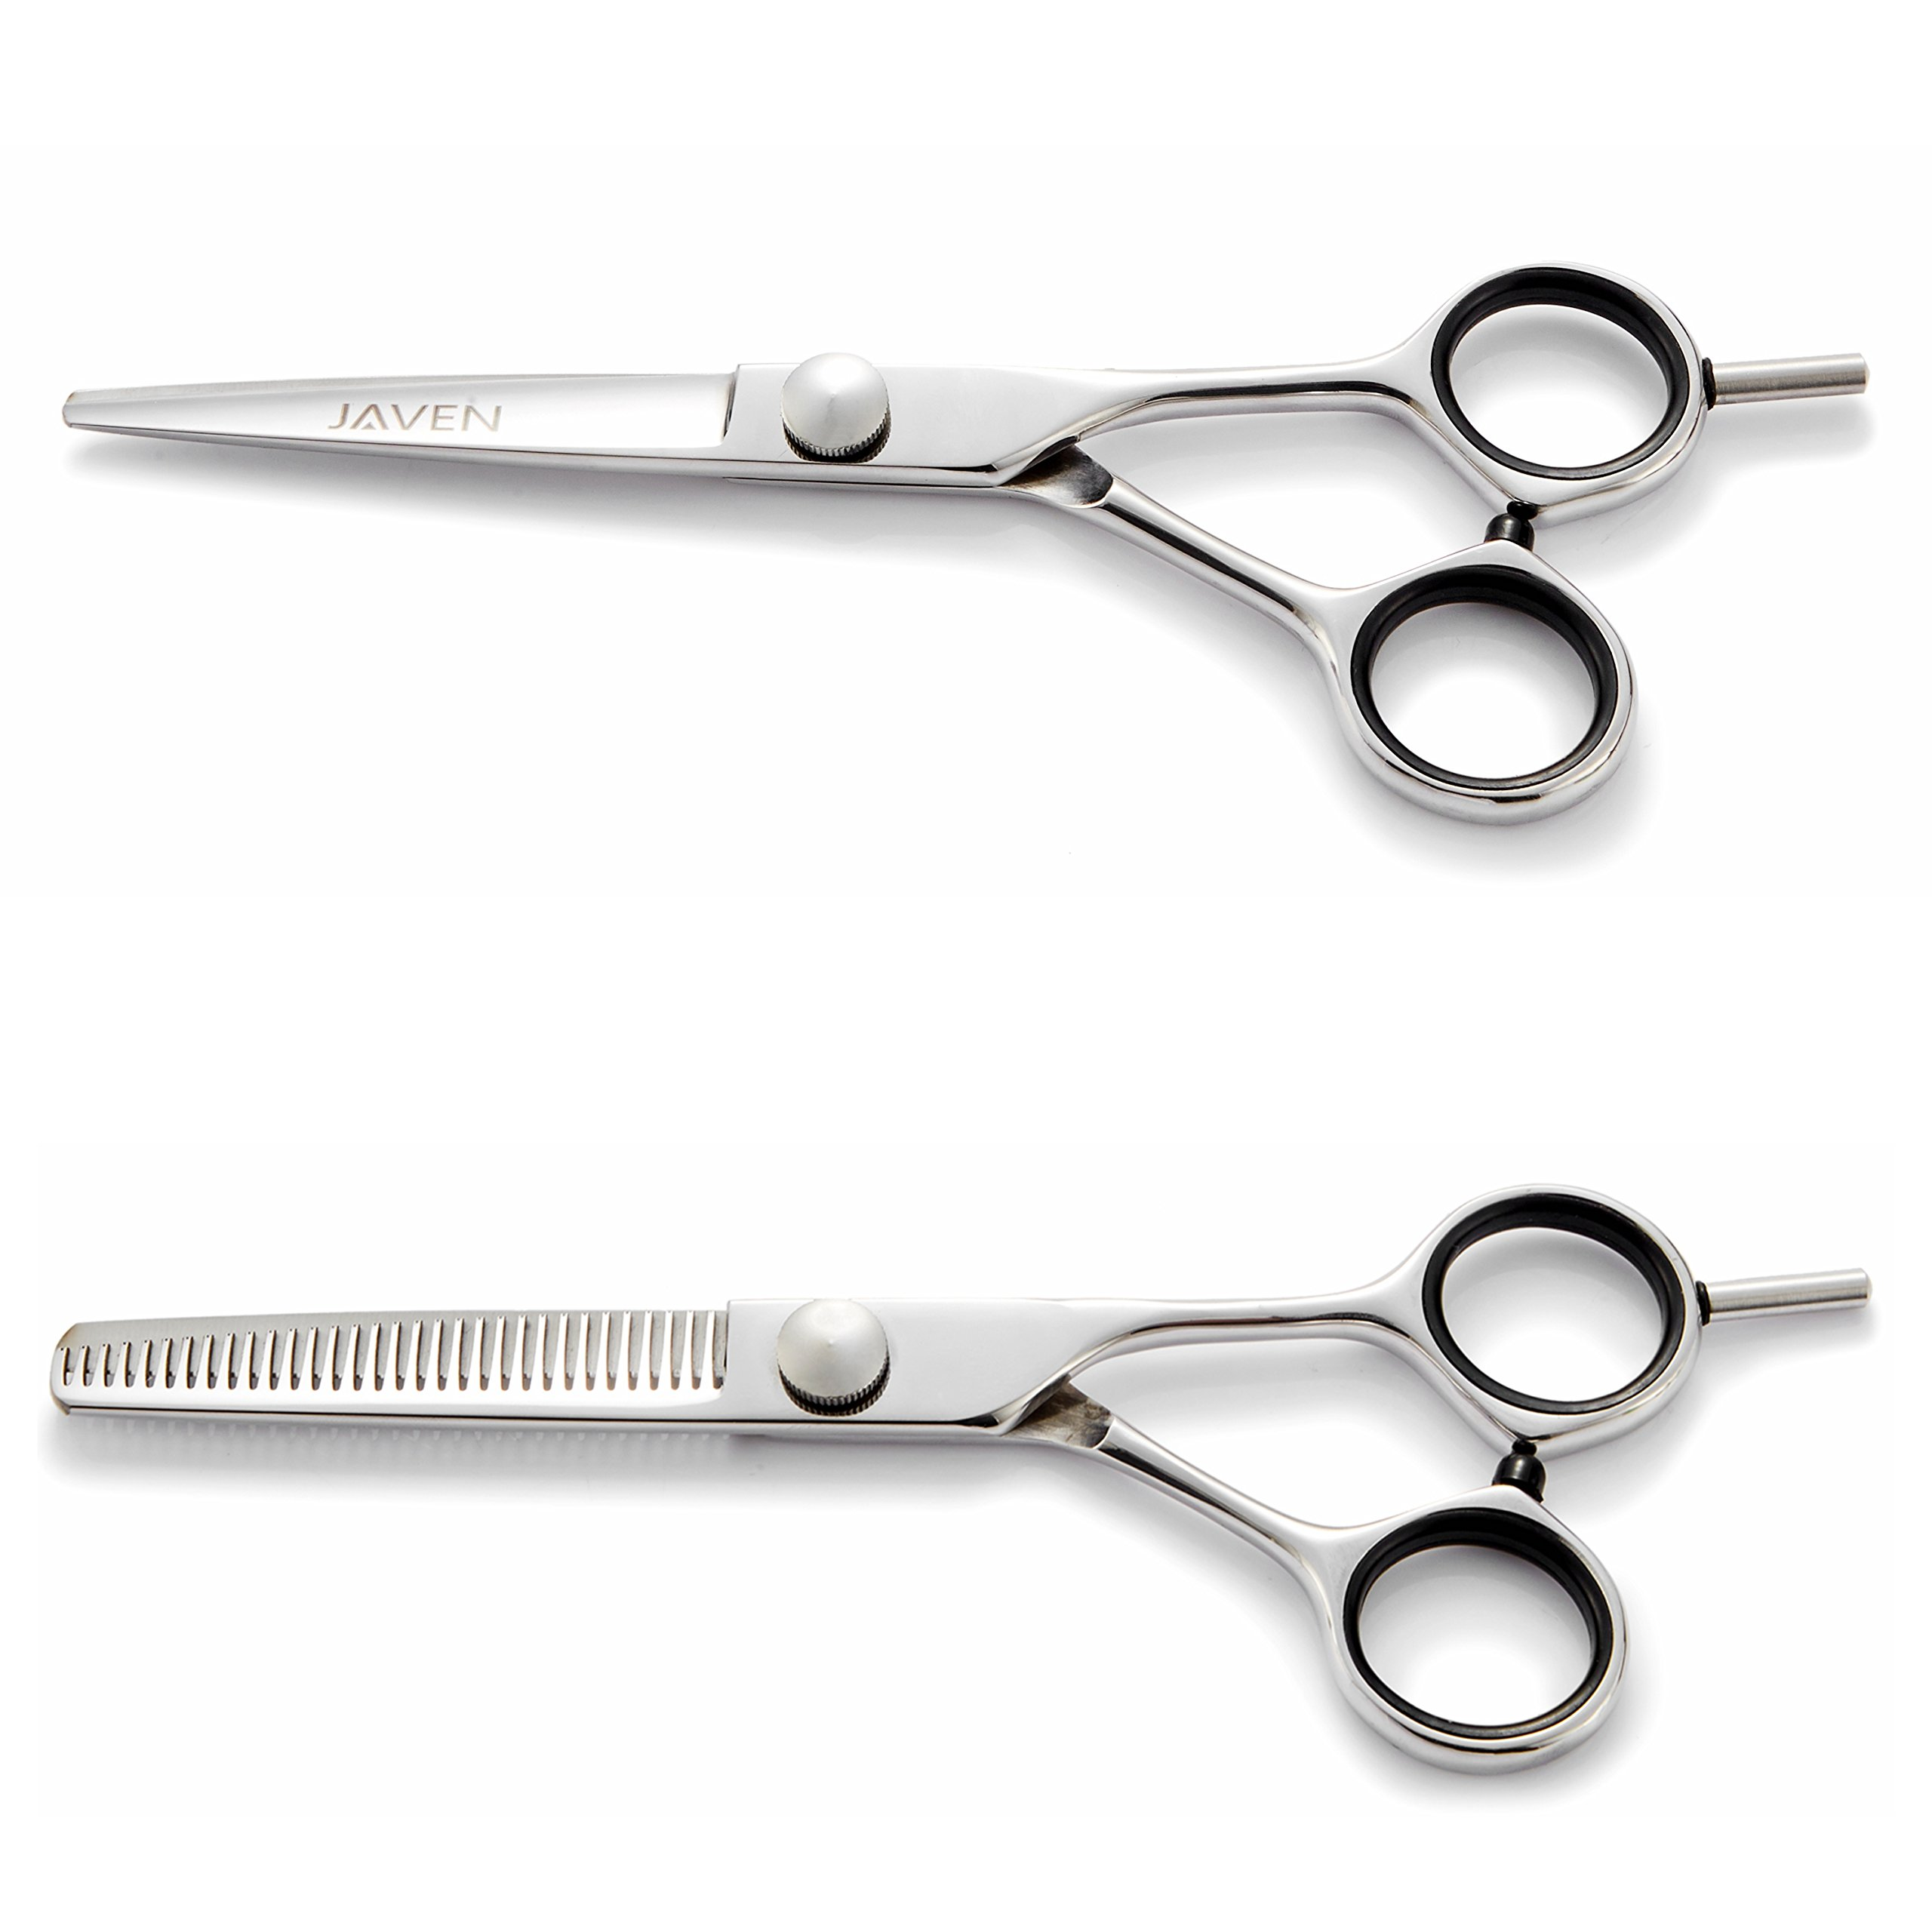 2018 Professional Hair Cutting Scissors Set,Japanese 6.5 Inch Hair Scissors Teflon Shears Hairdressing Scissors Barber Thinning Scissors Hairdresser Razor Edge Haircut Right hand use by JAVENPROLIU (Image #4)